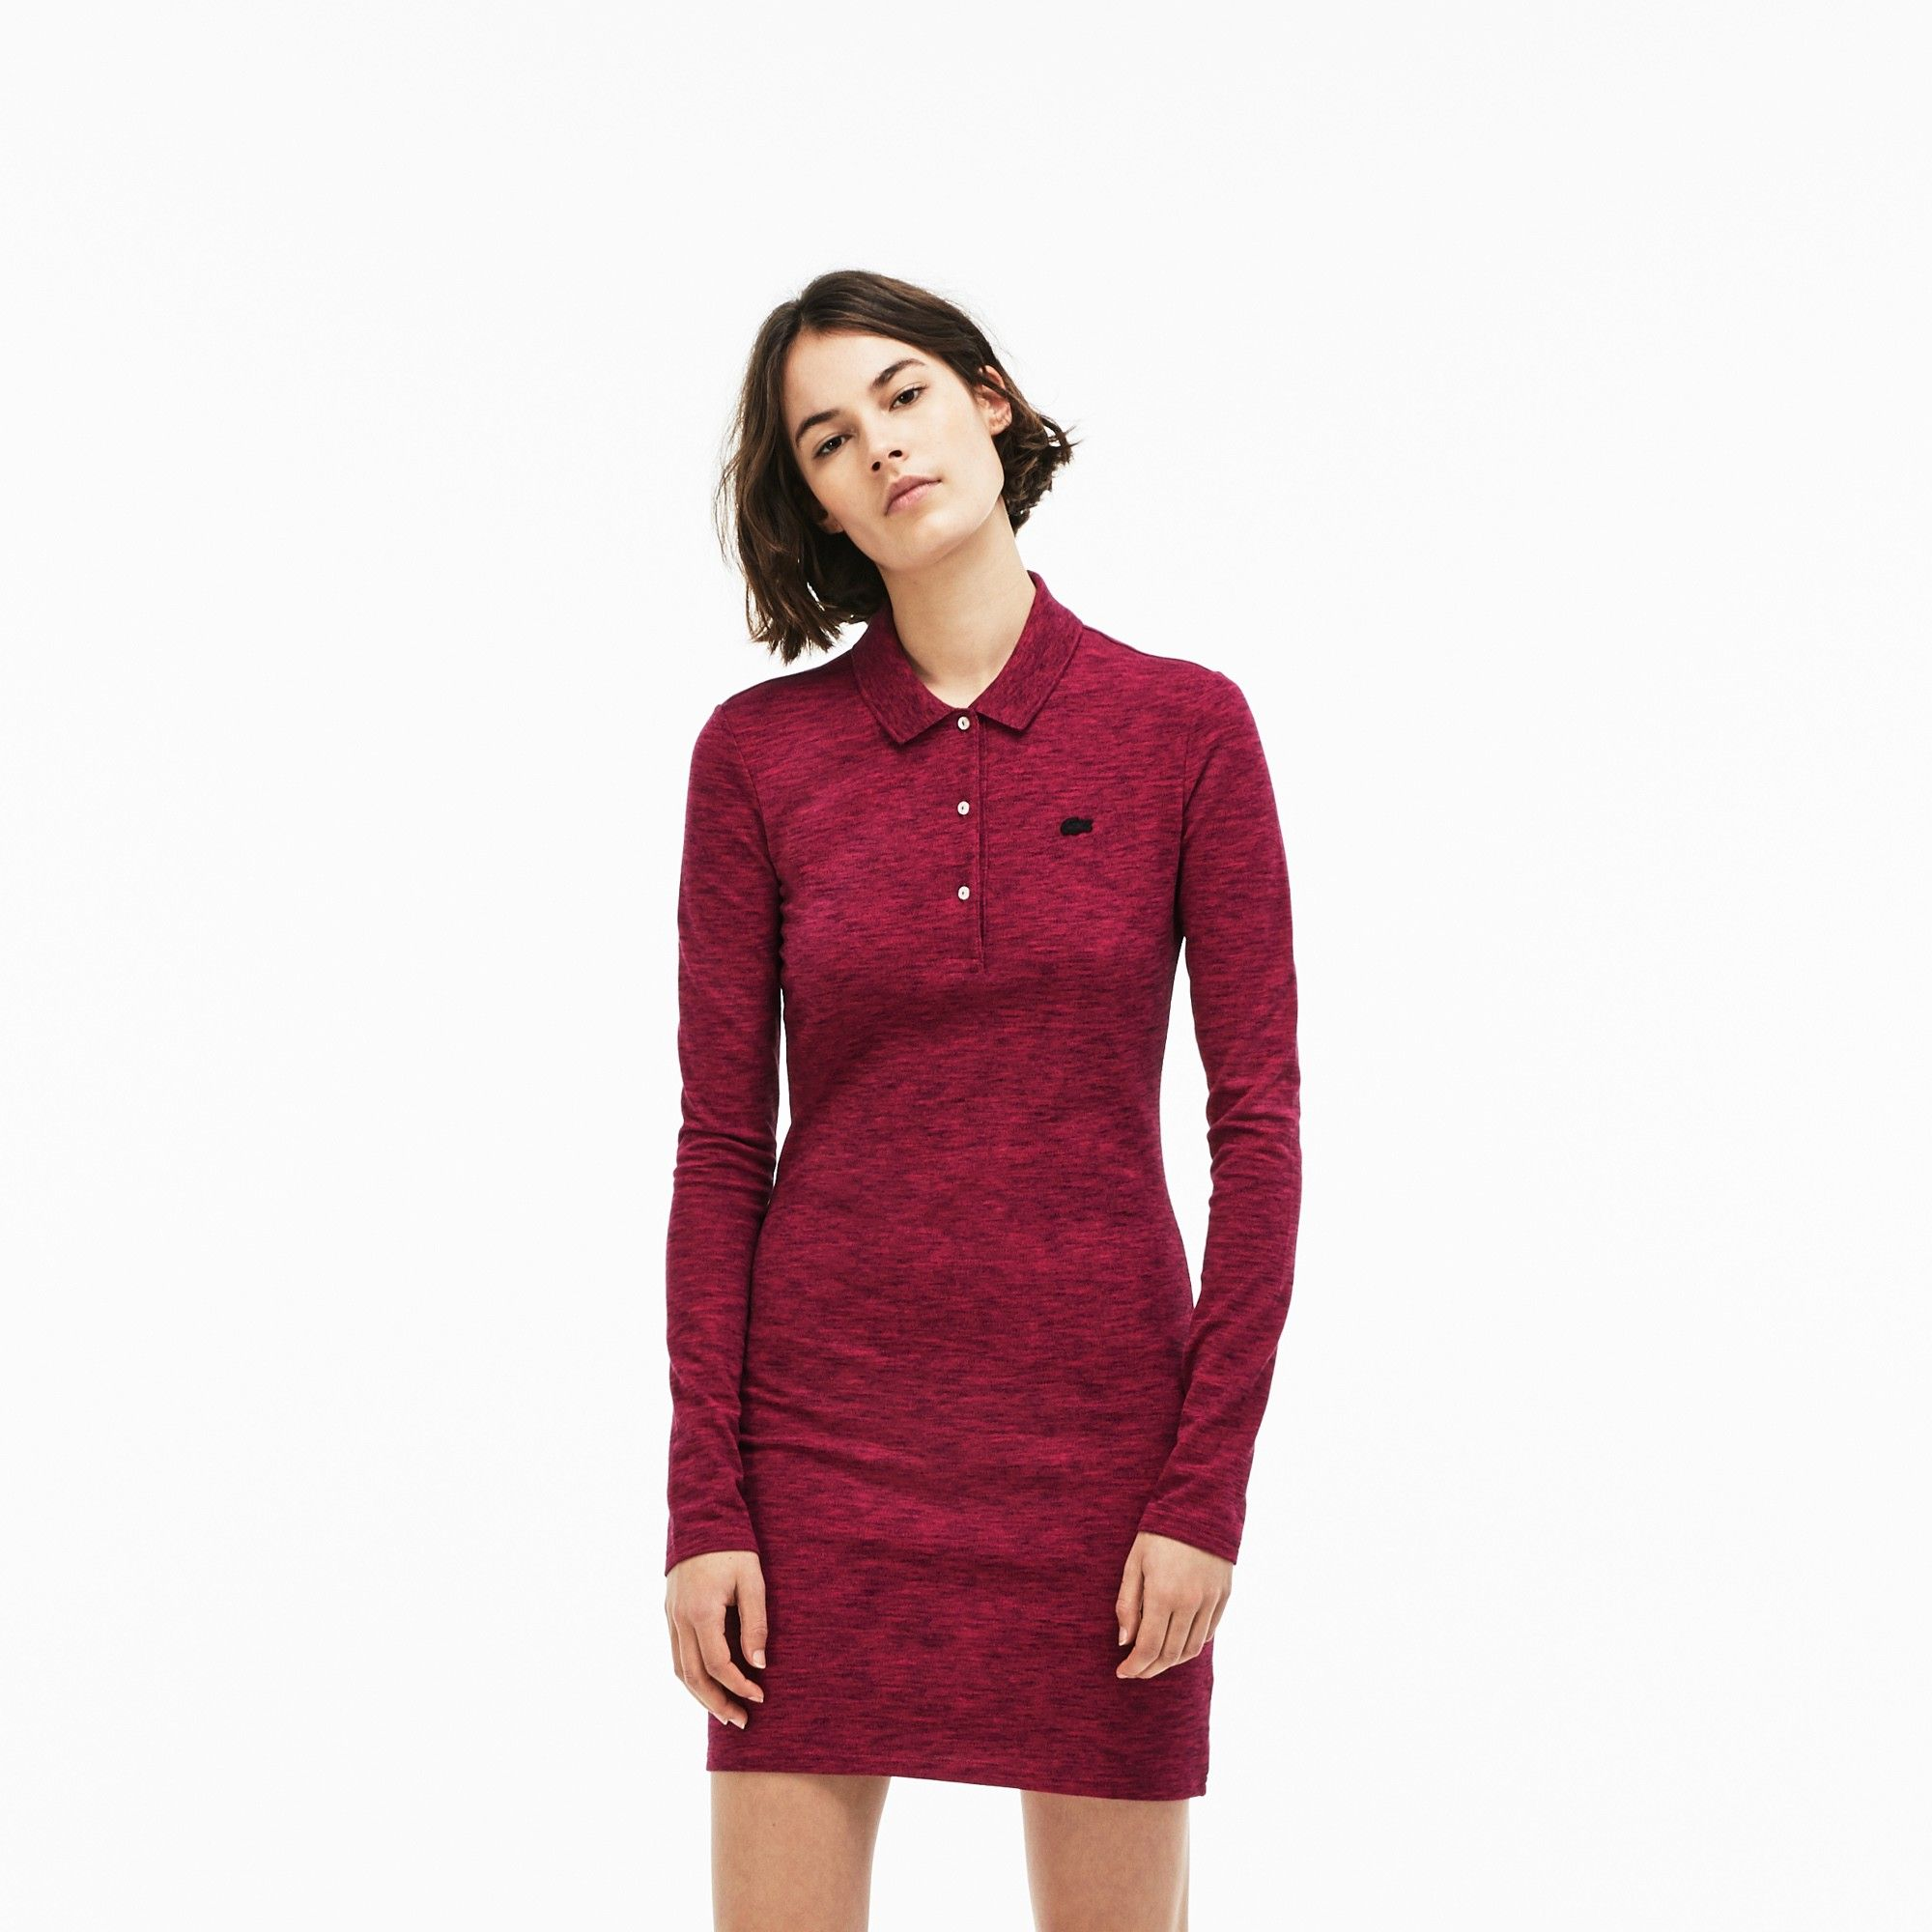 426a41ebf5 Lacoste Women's Live Slim Fit Stretch Piqué Polo Dress - Navy Blue ...